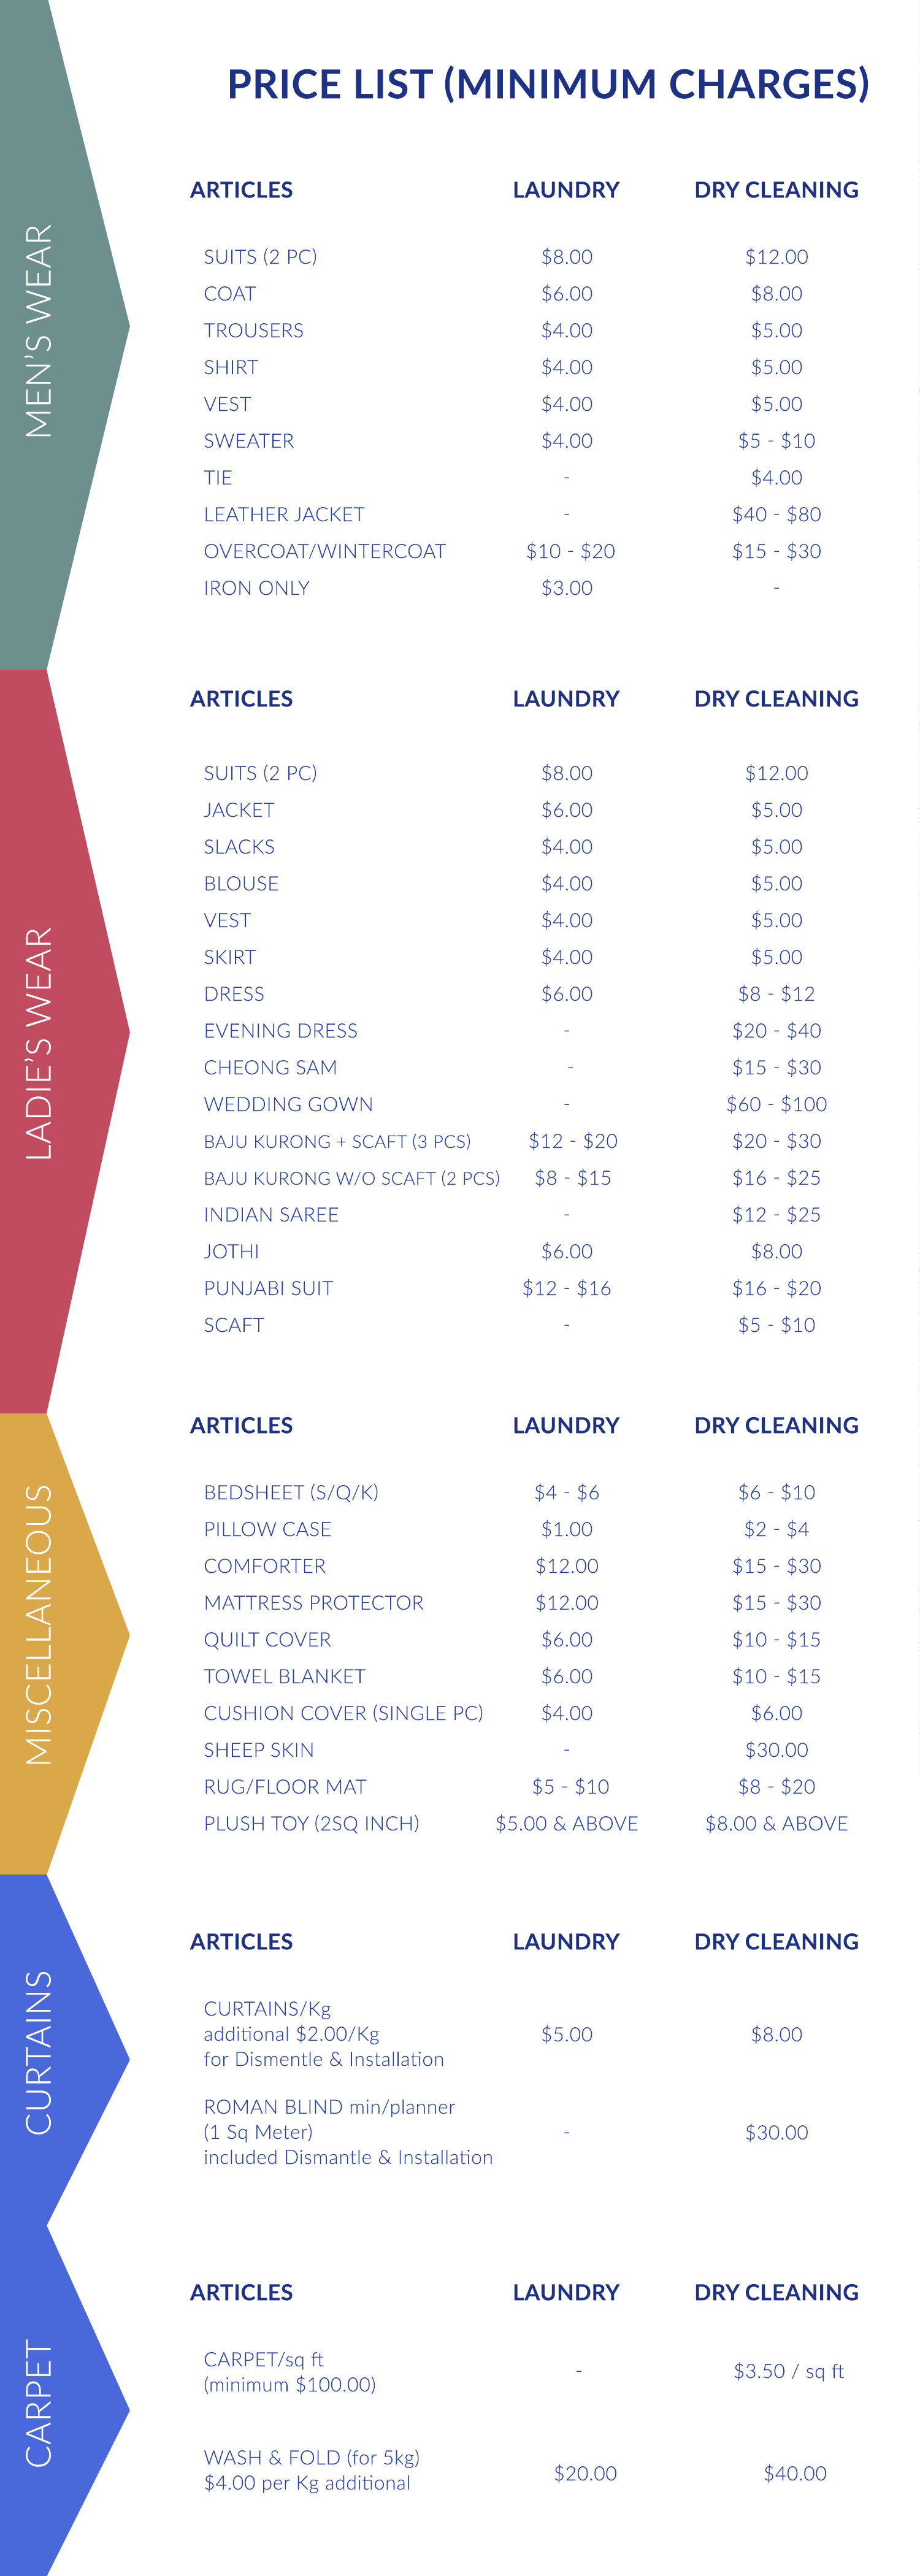 white-price-list